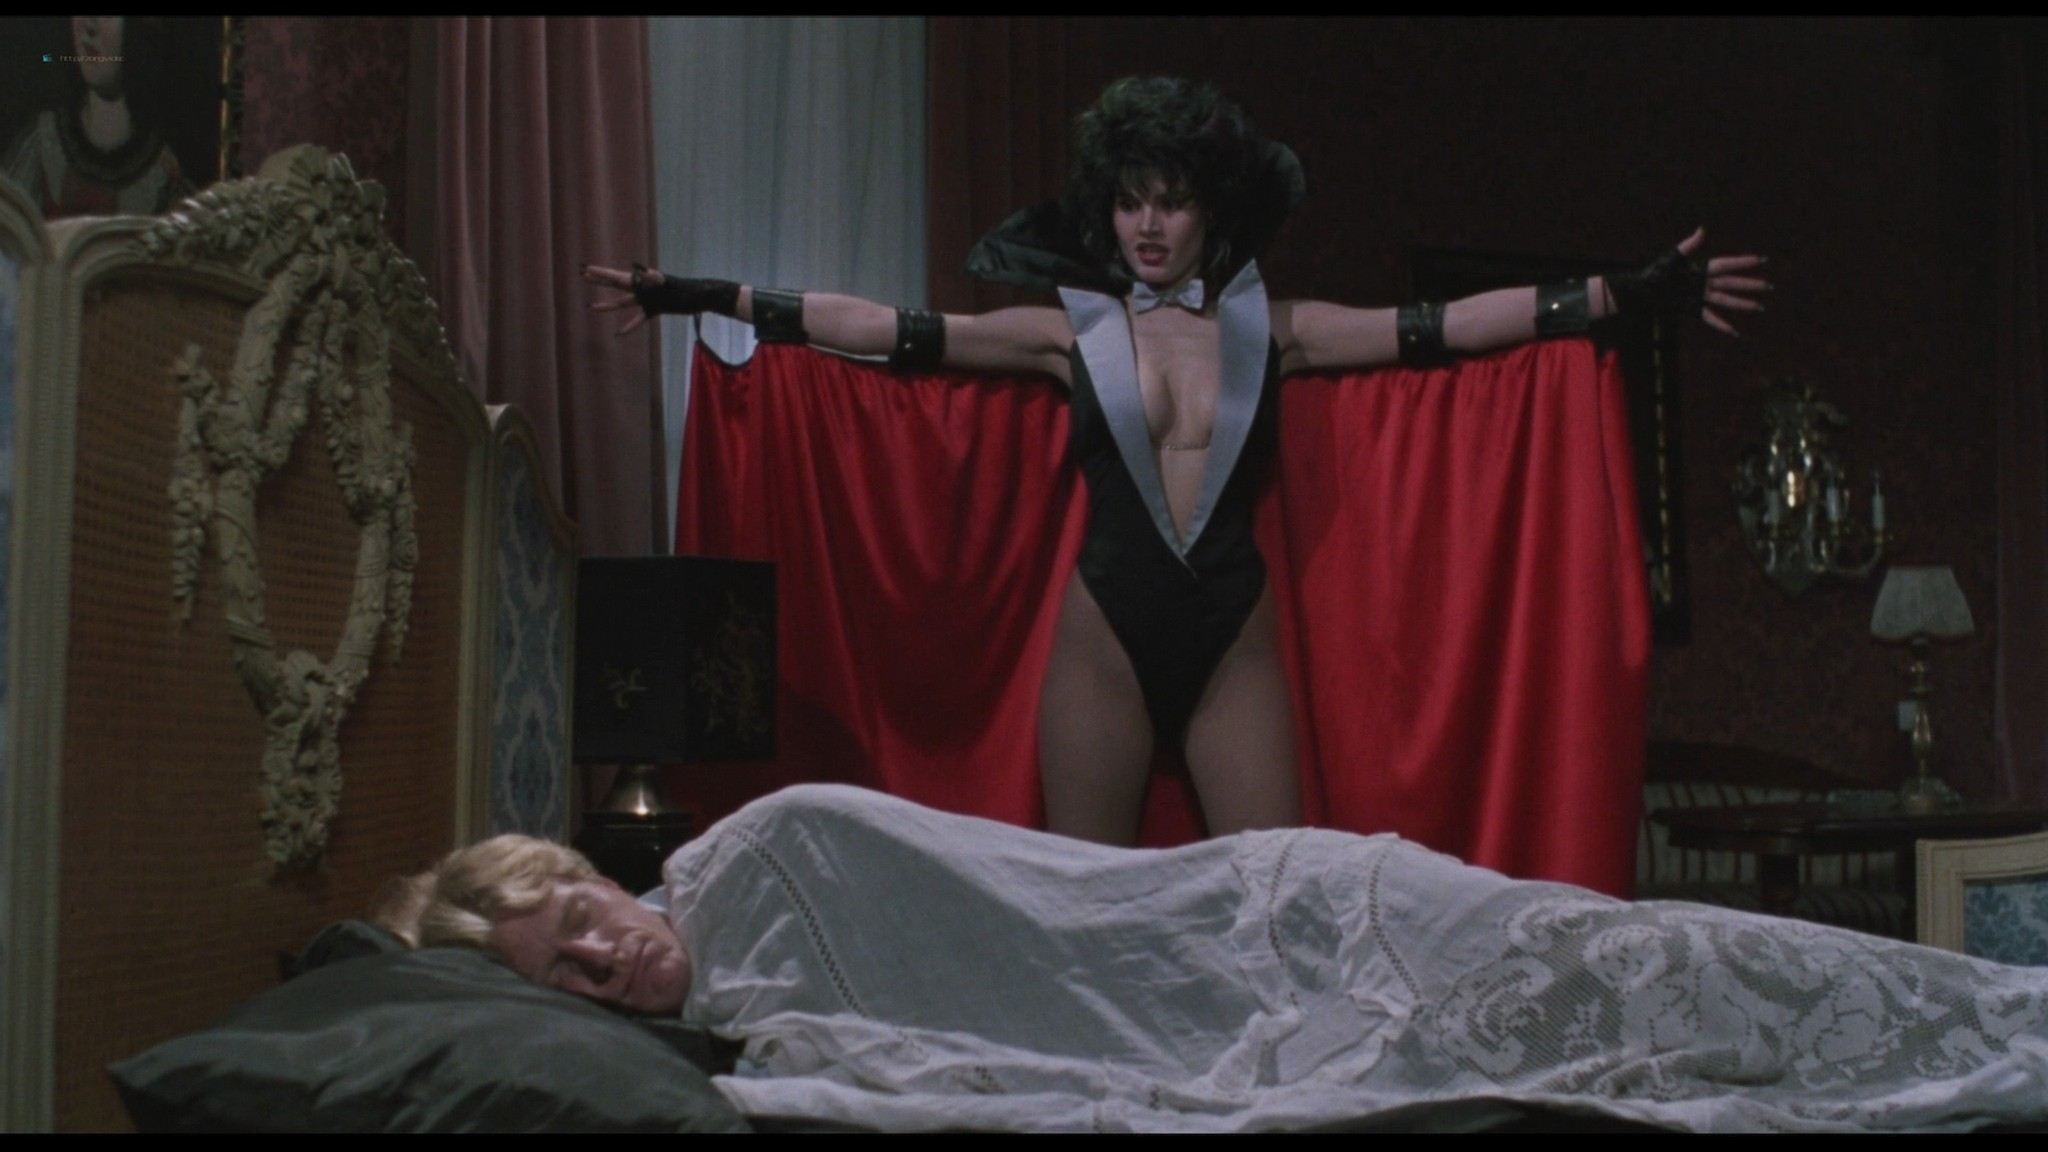 Geena Davis hot and sexy Ksenia Prohaska sexy - Transylvania 6-5000 (1985) HD 1080p BluRay (19)